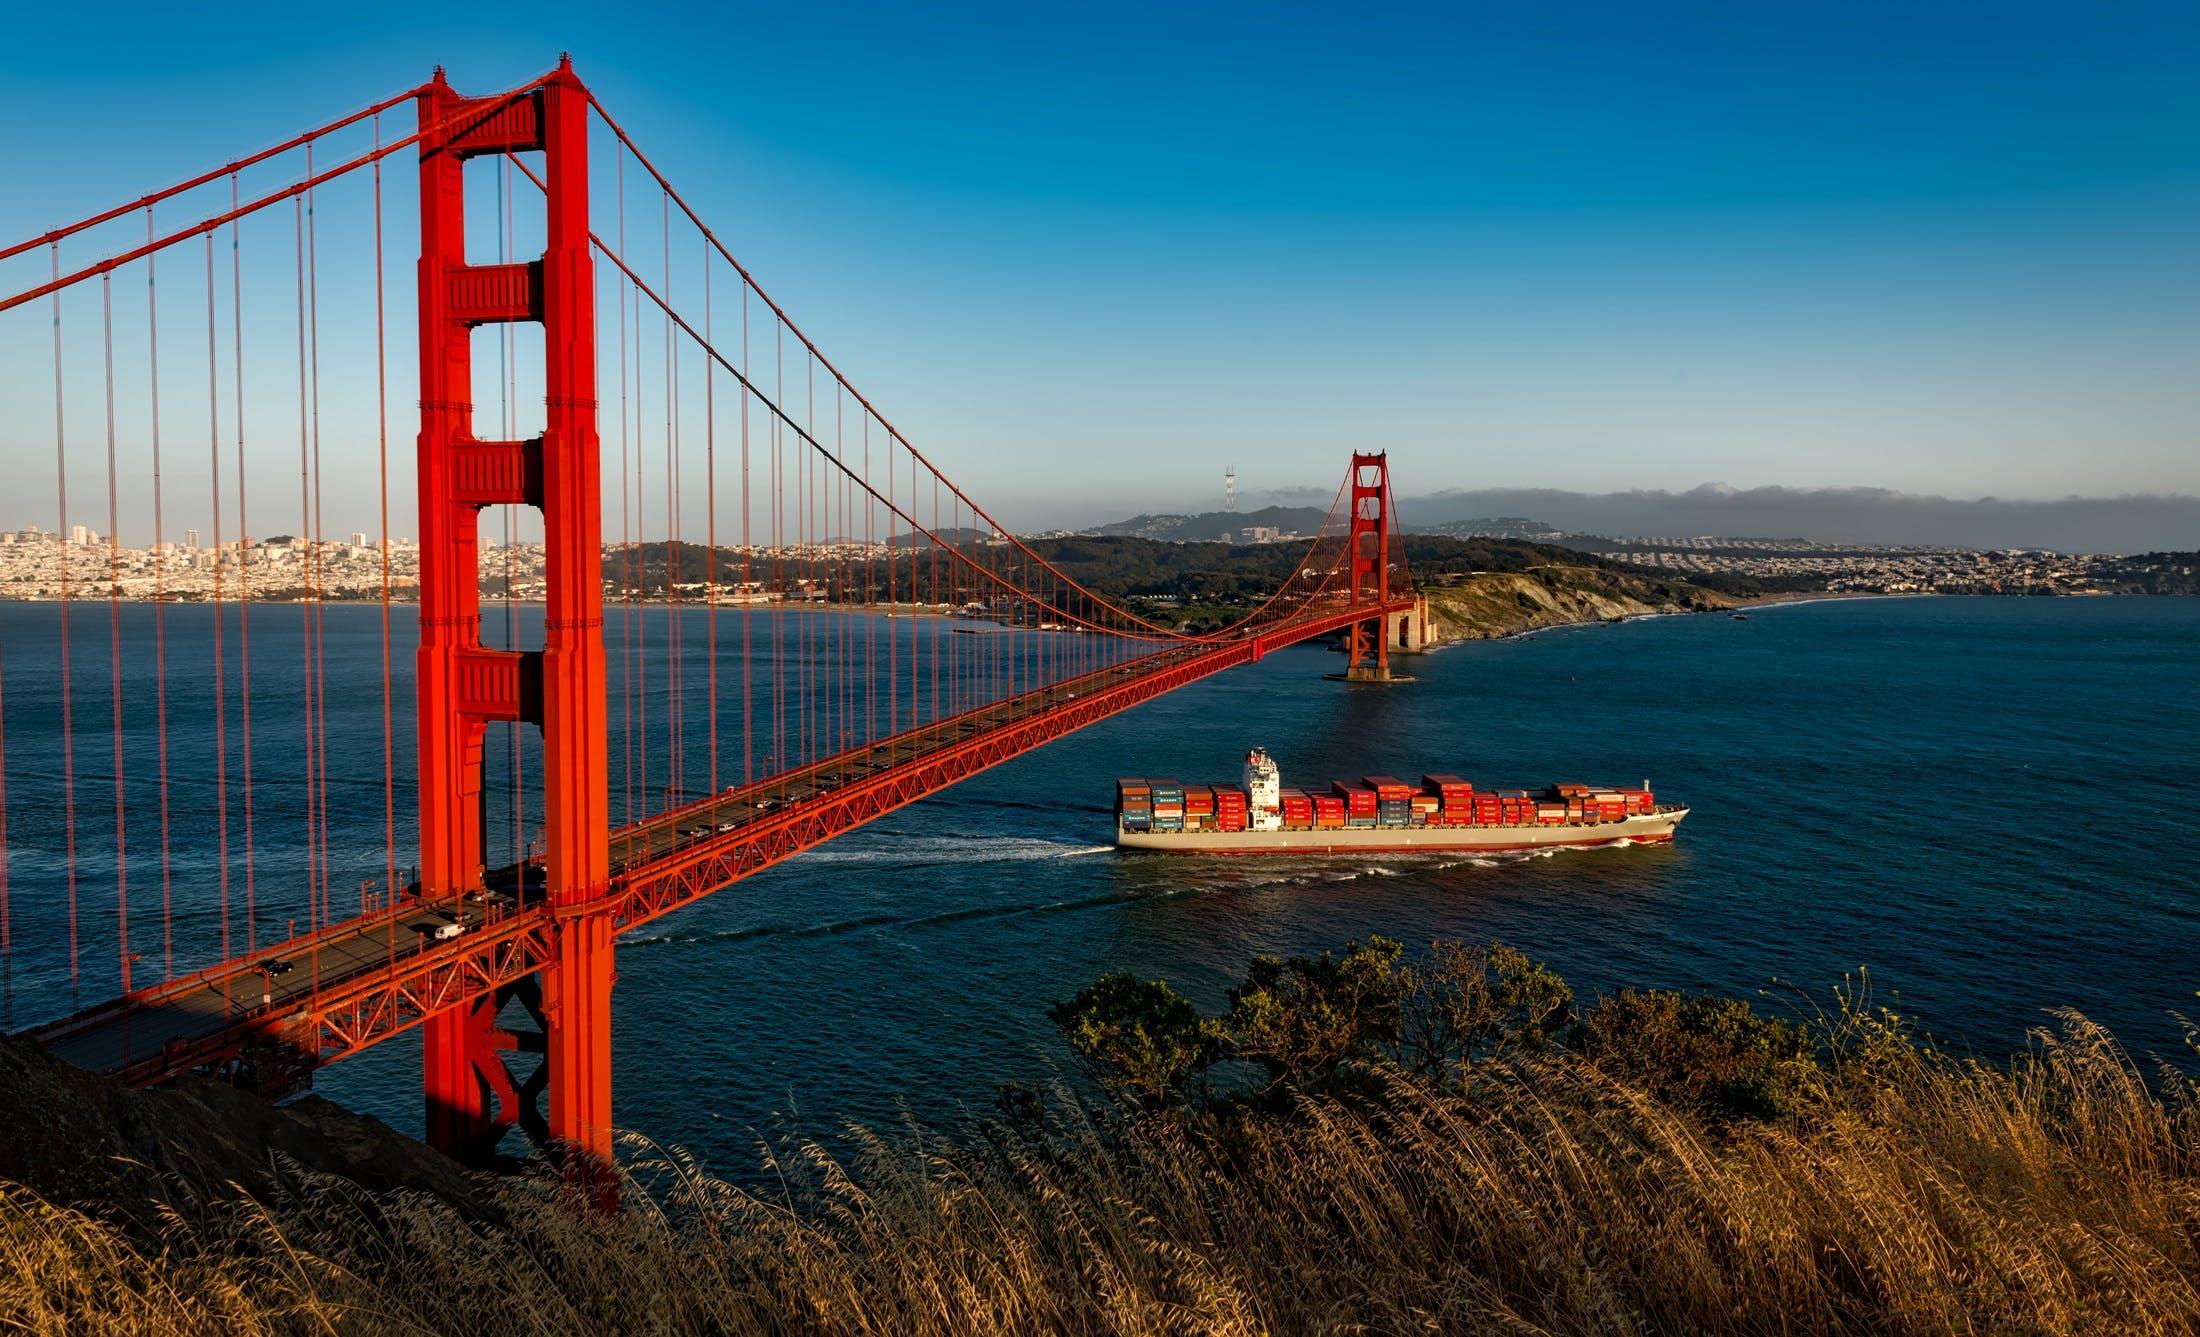 Gratis lagerfoto af arkitektur, båd, berømt, bro